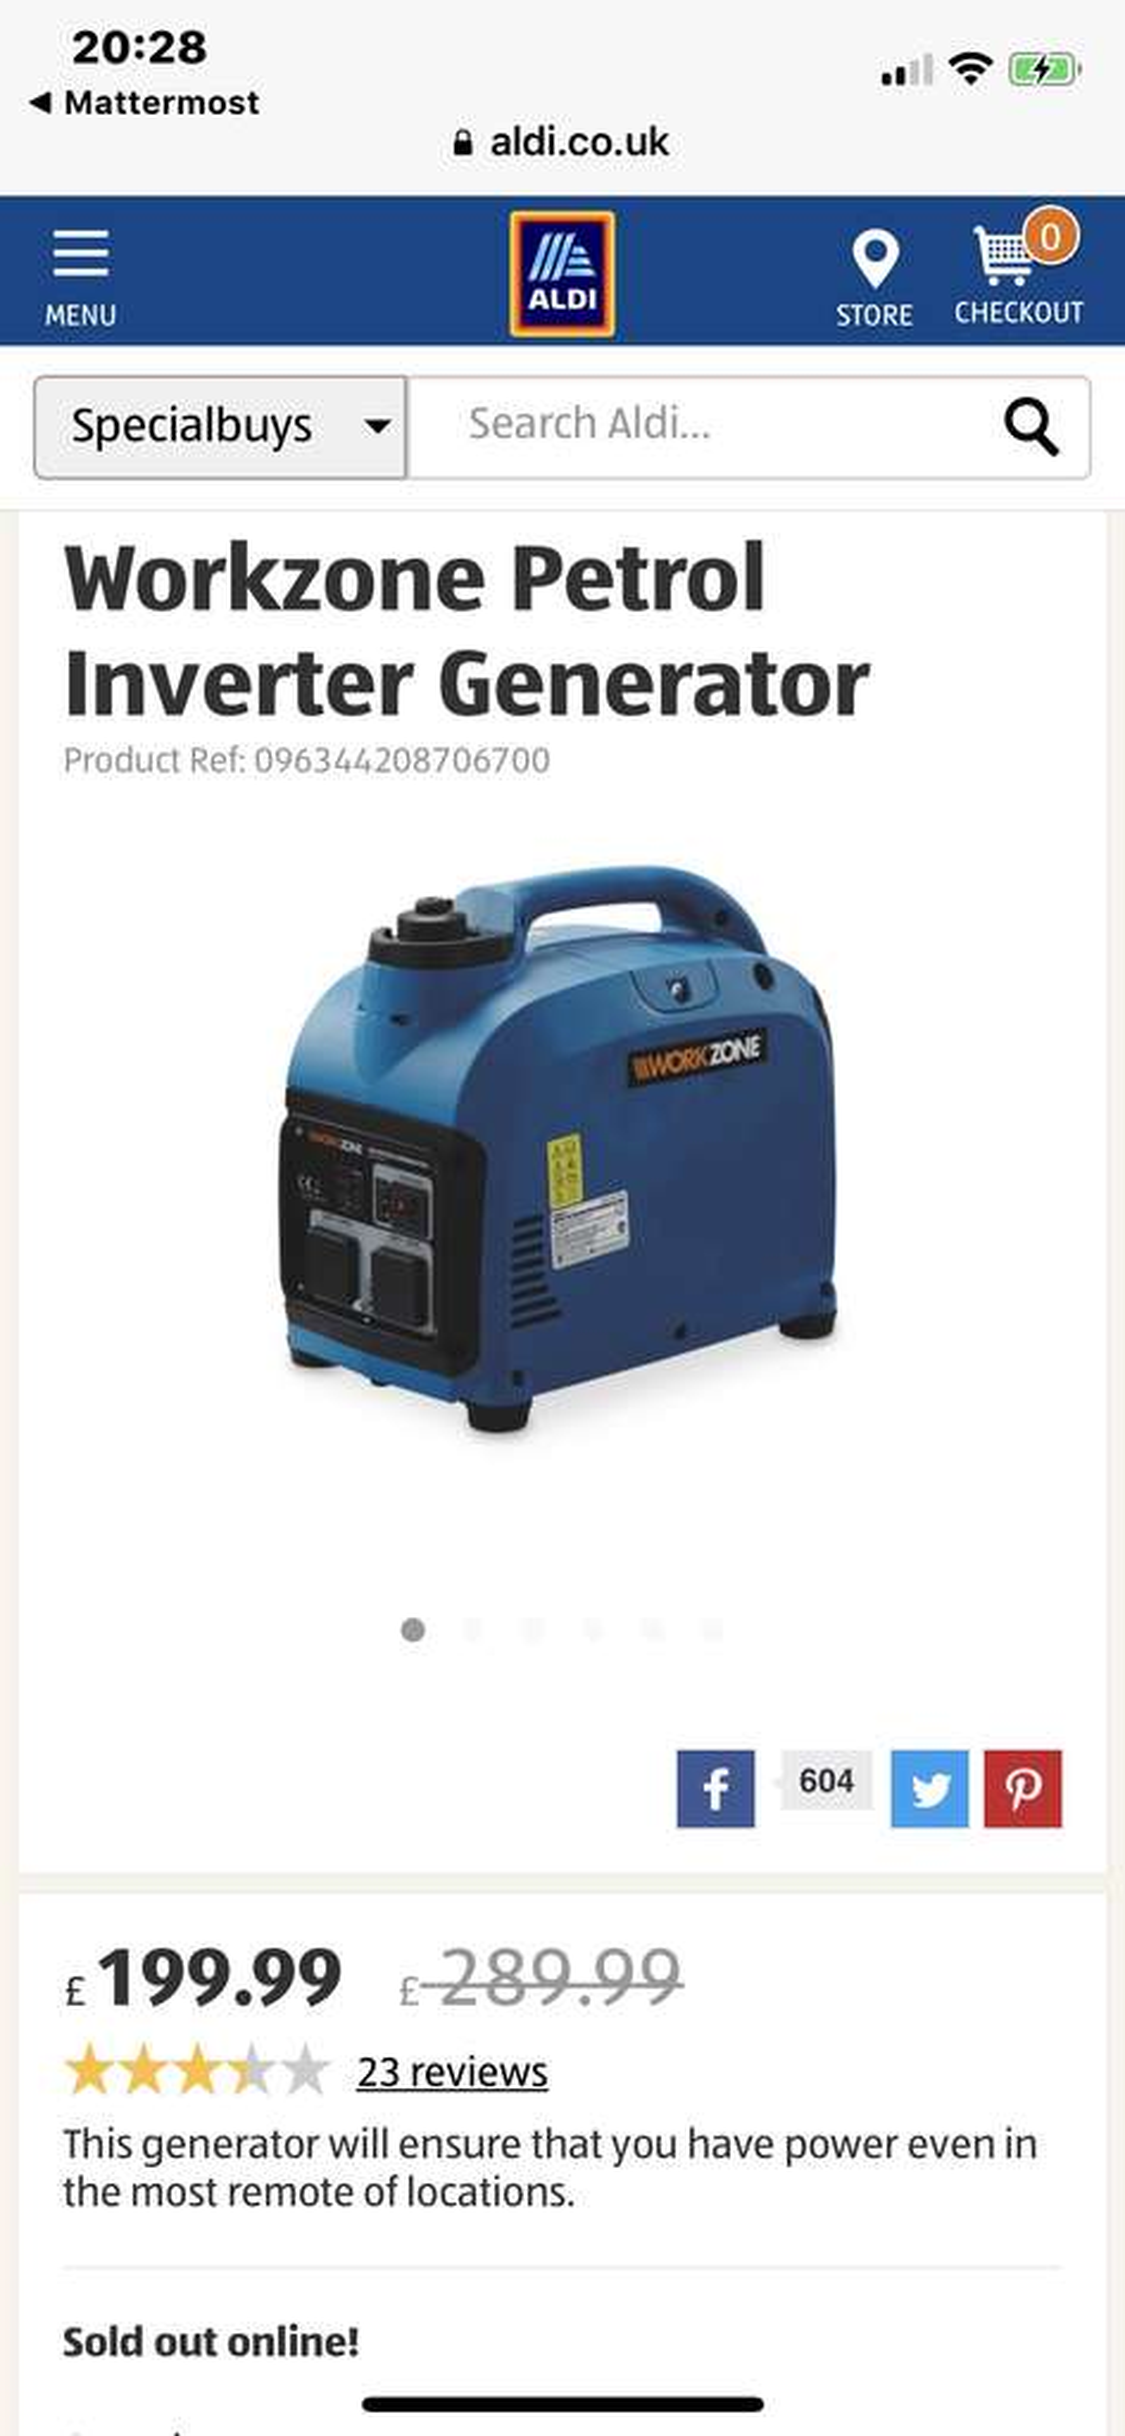 Workzone Petrol Inverter Generator 163 199 99 Aldi Hotukdeals